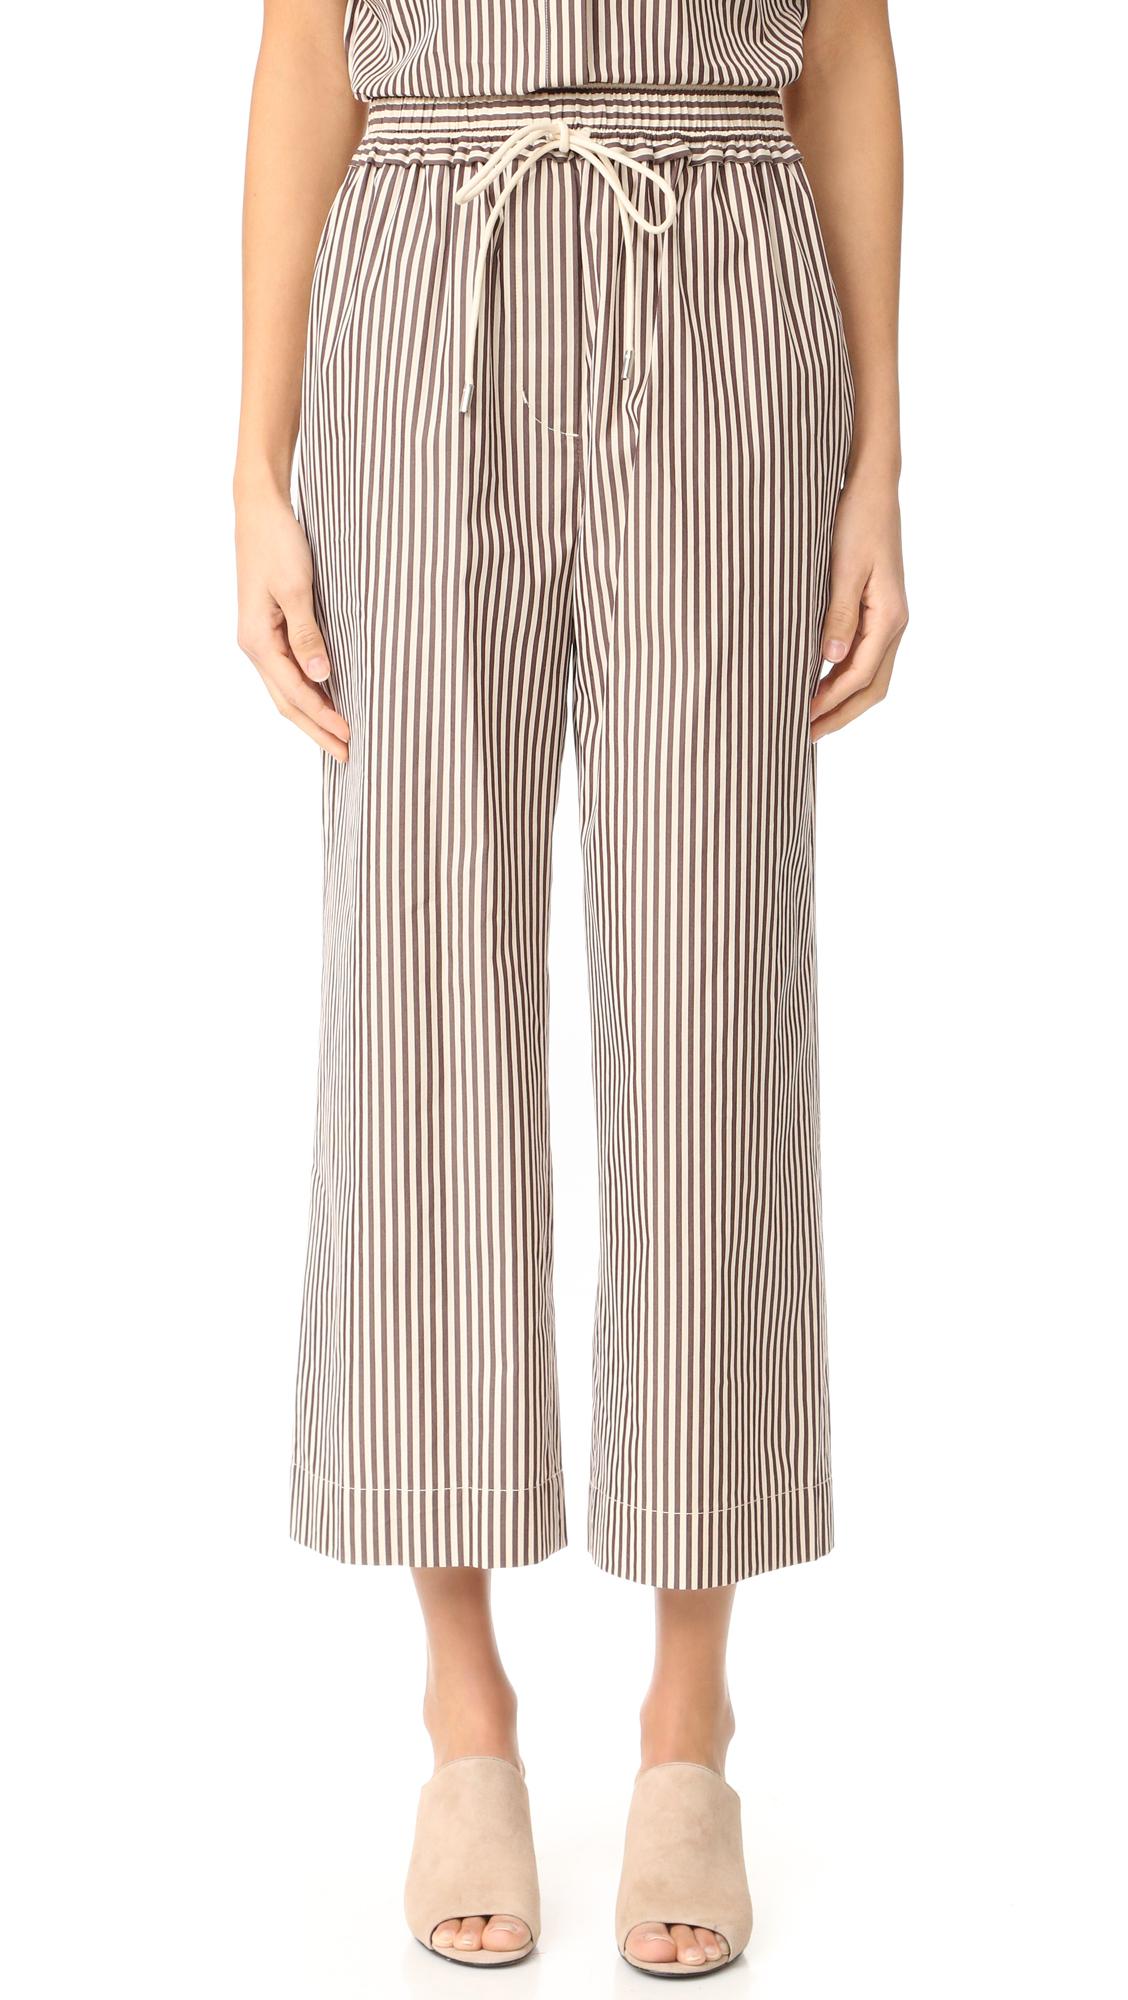 3.1 Phillip Lim Stripe Drawstring Pants - Ecru Brown at Shopbop